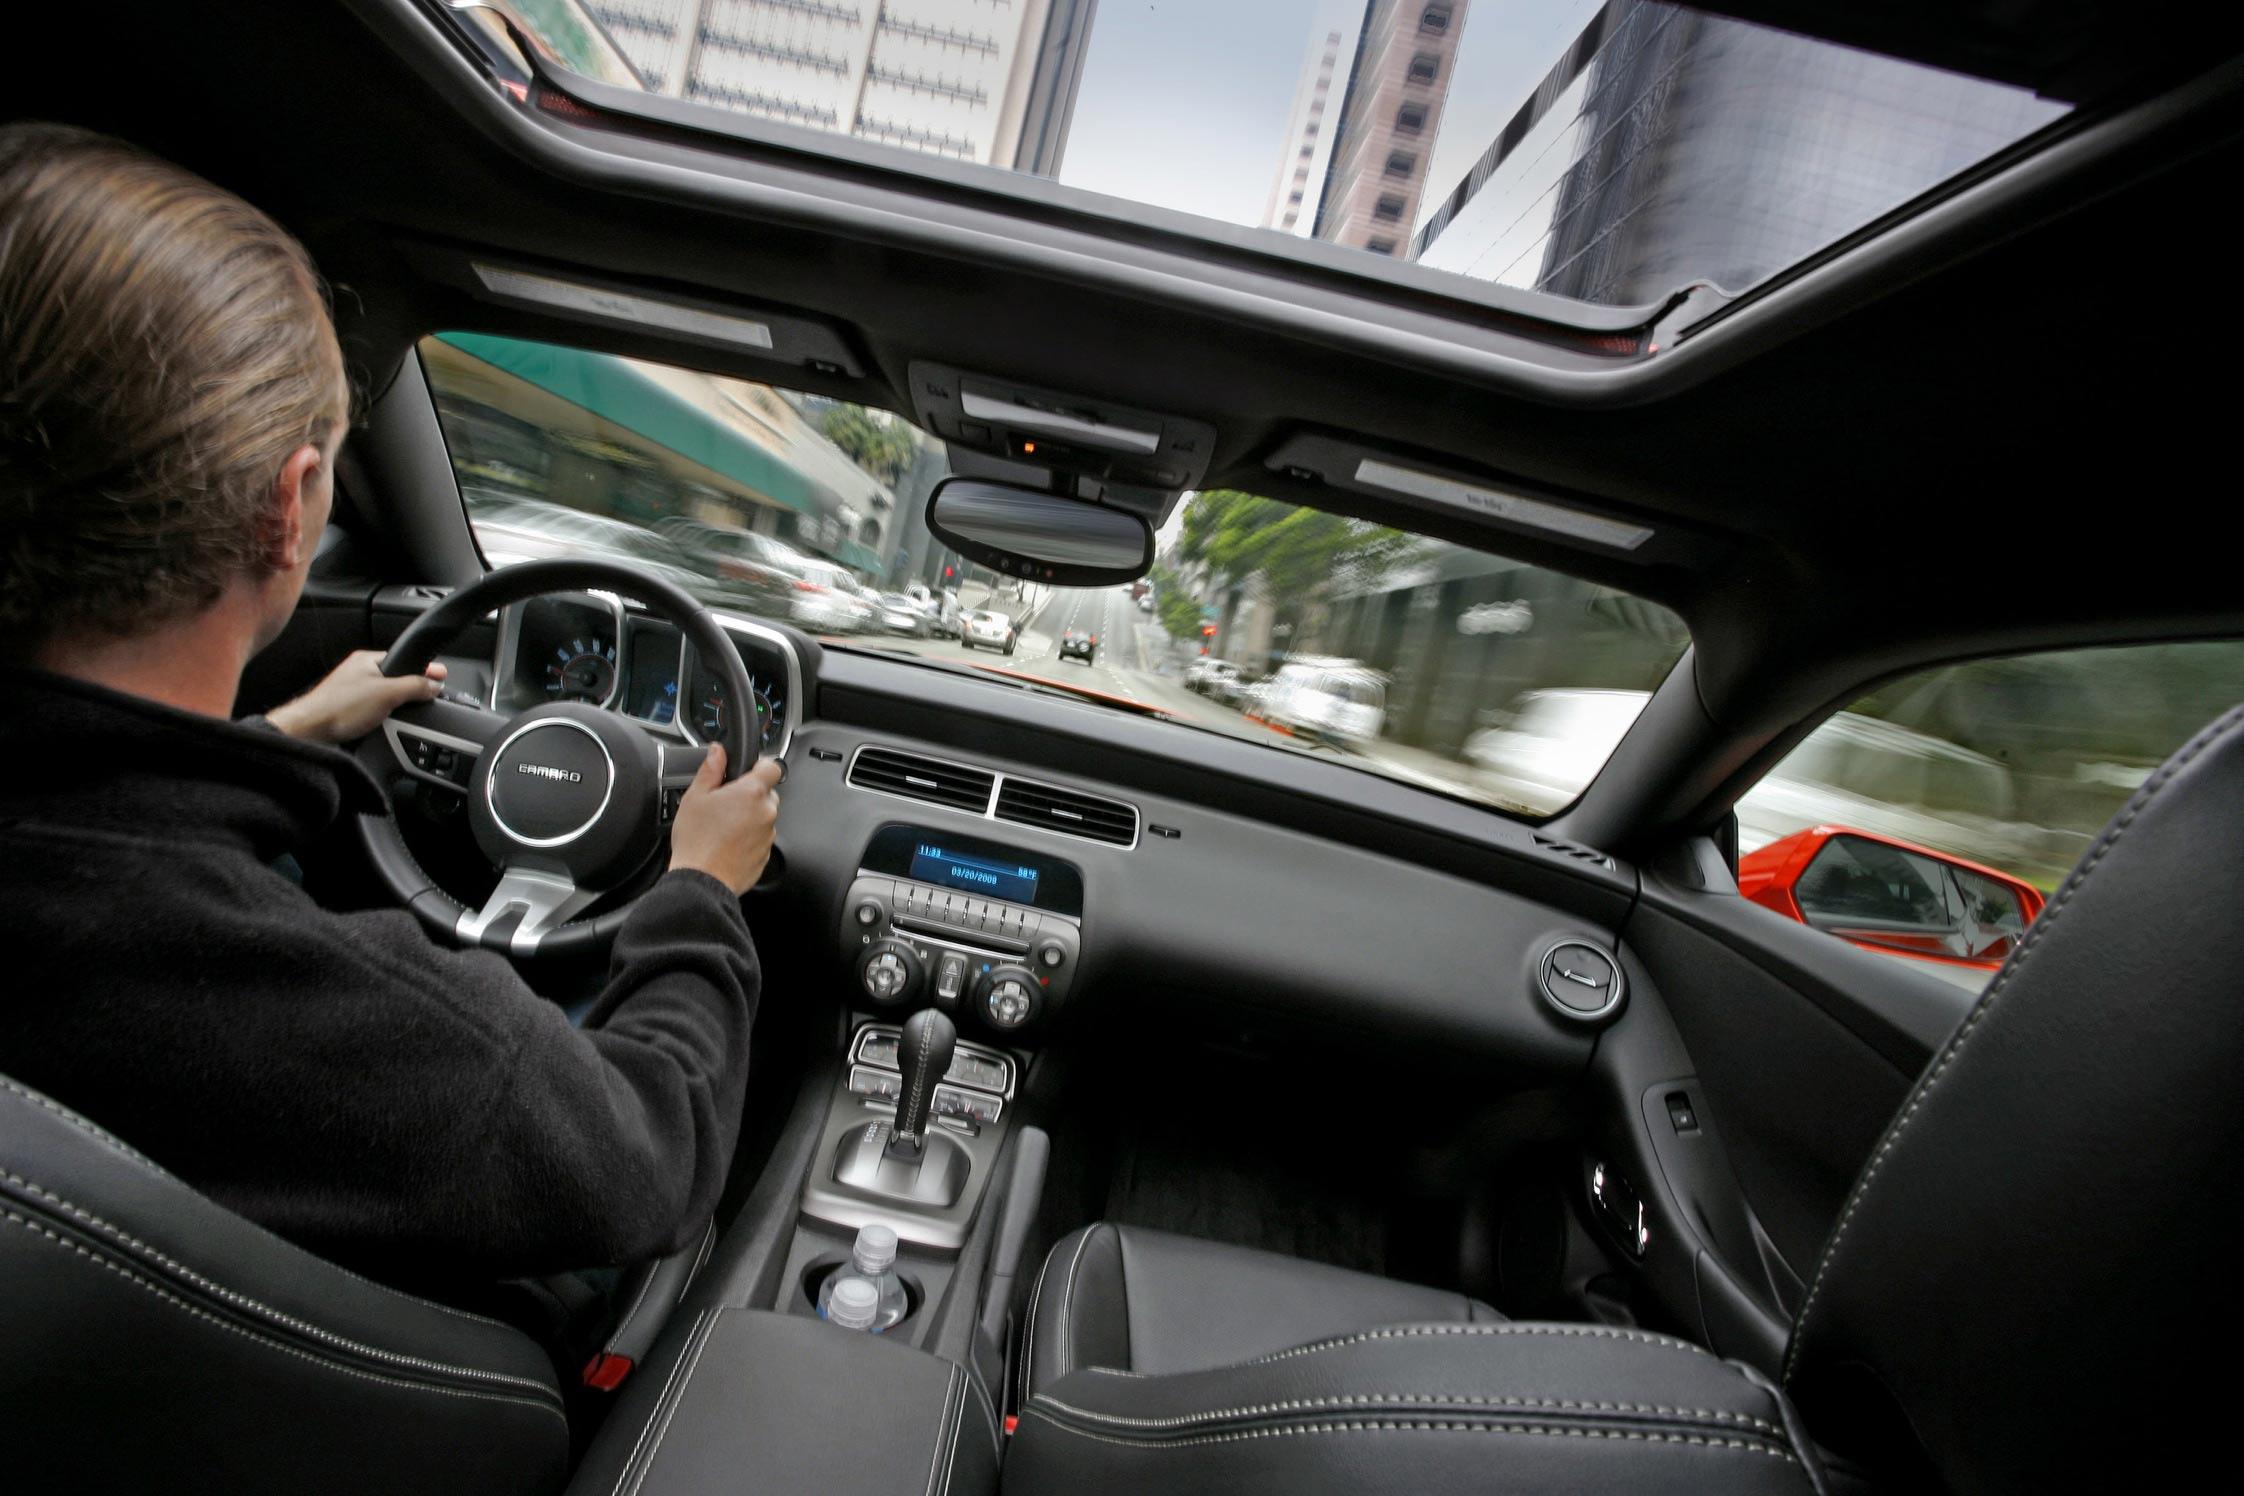 Essai chevrolet camaro ss motorlegend for Chevrolet interieur